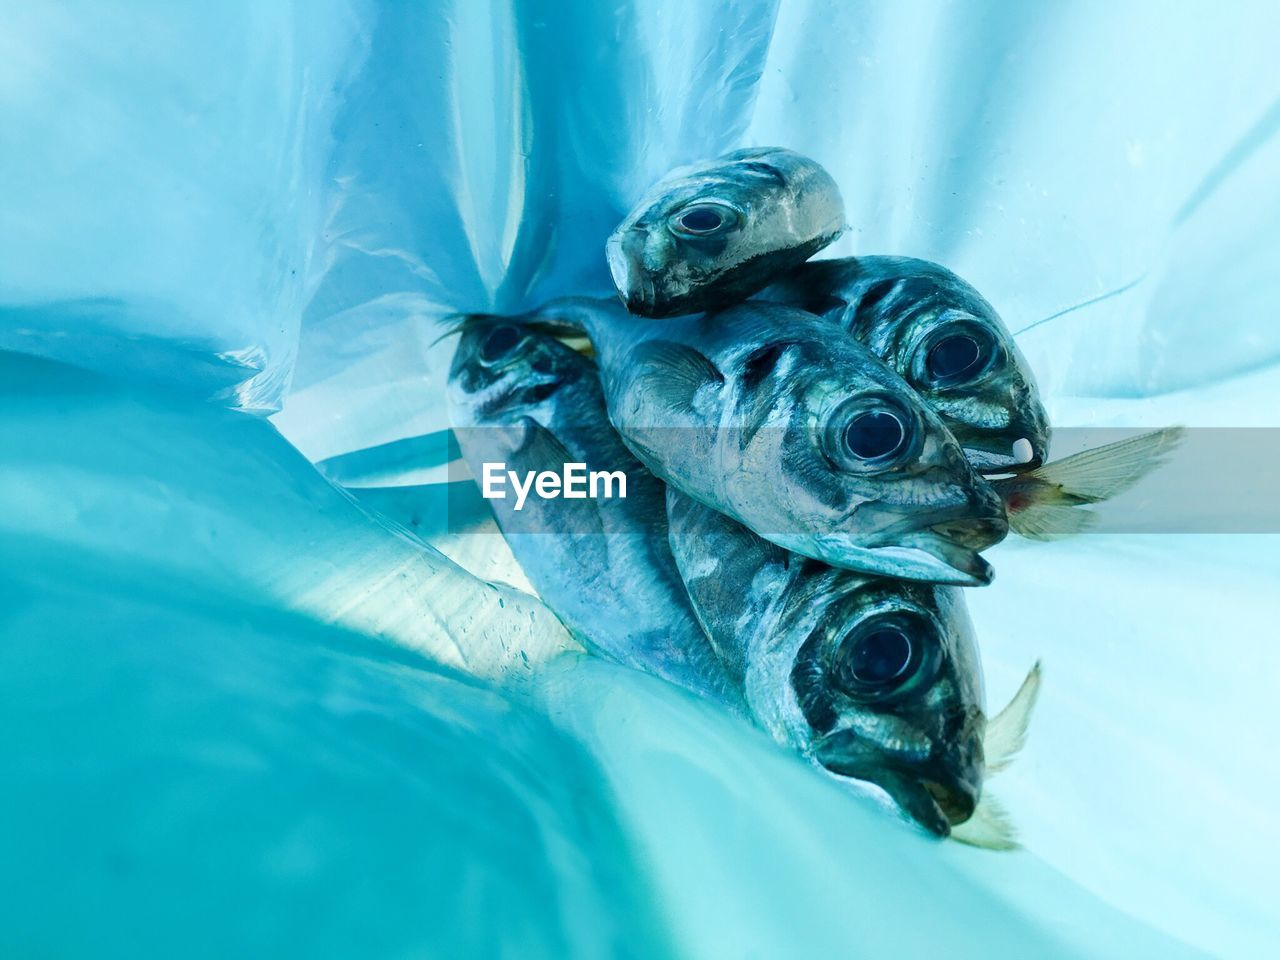 Close-Up Of Fish In Plastic Bag